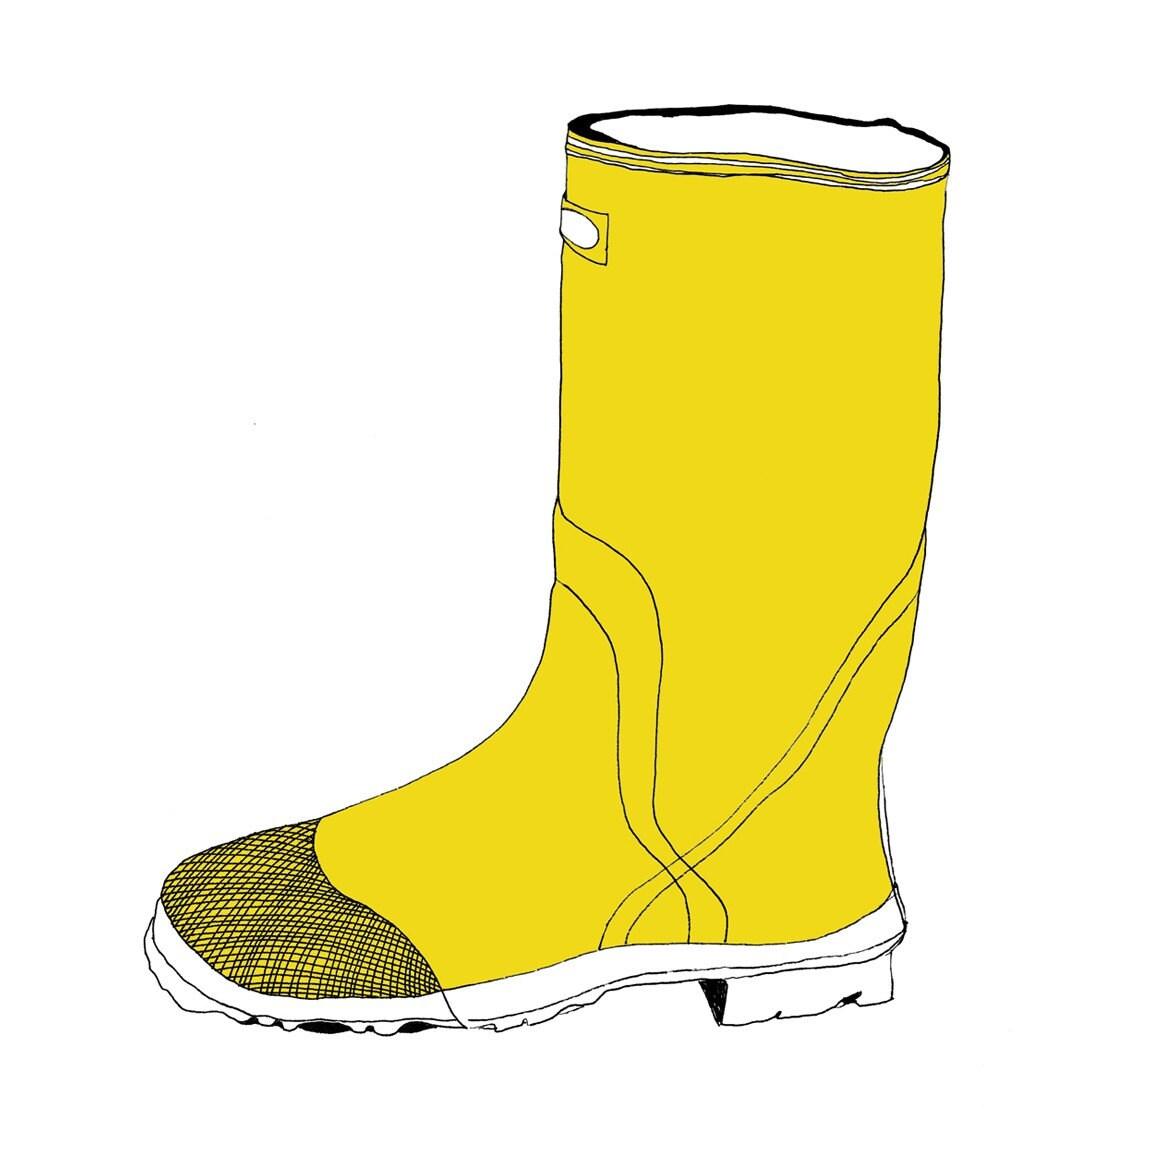 My favorite yellow boot - print